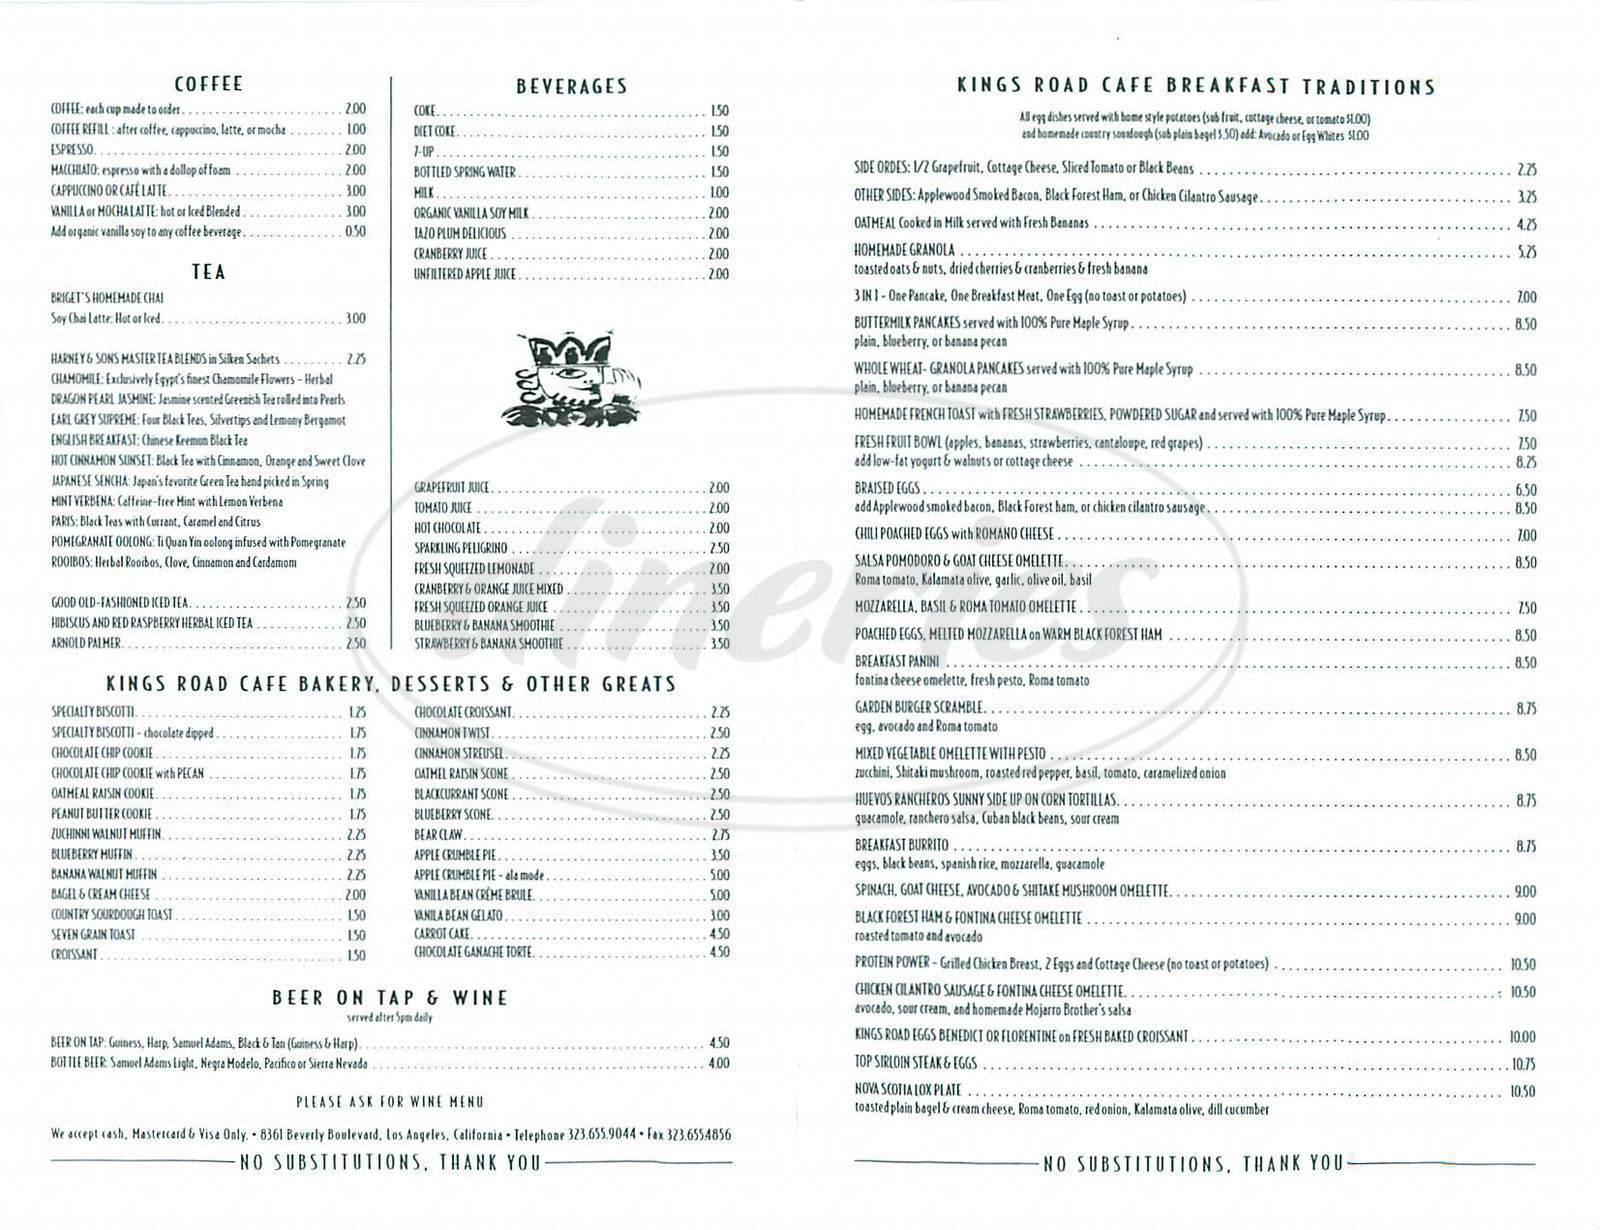 menu for Kings Road Cafe